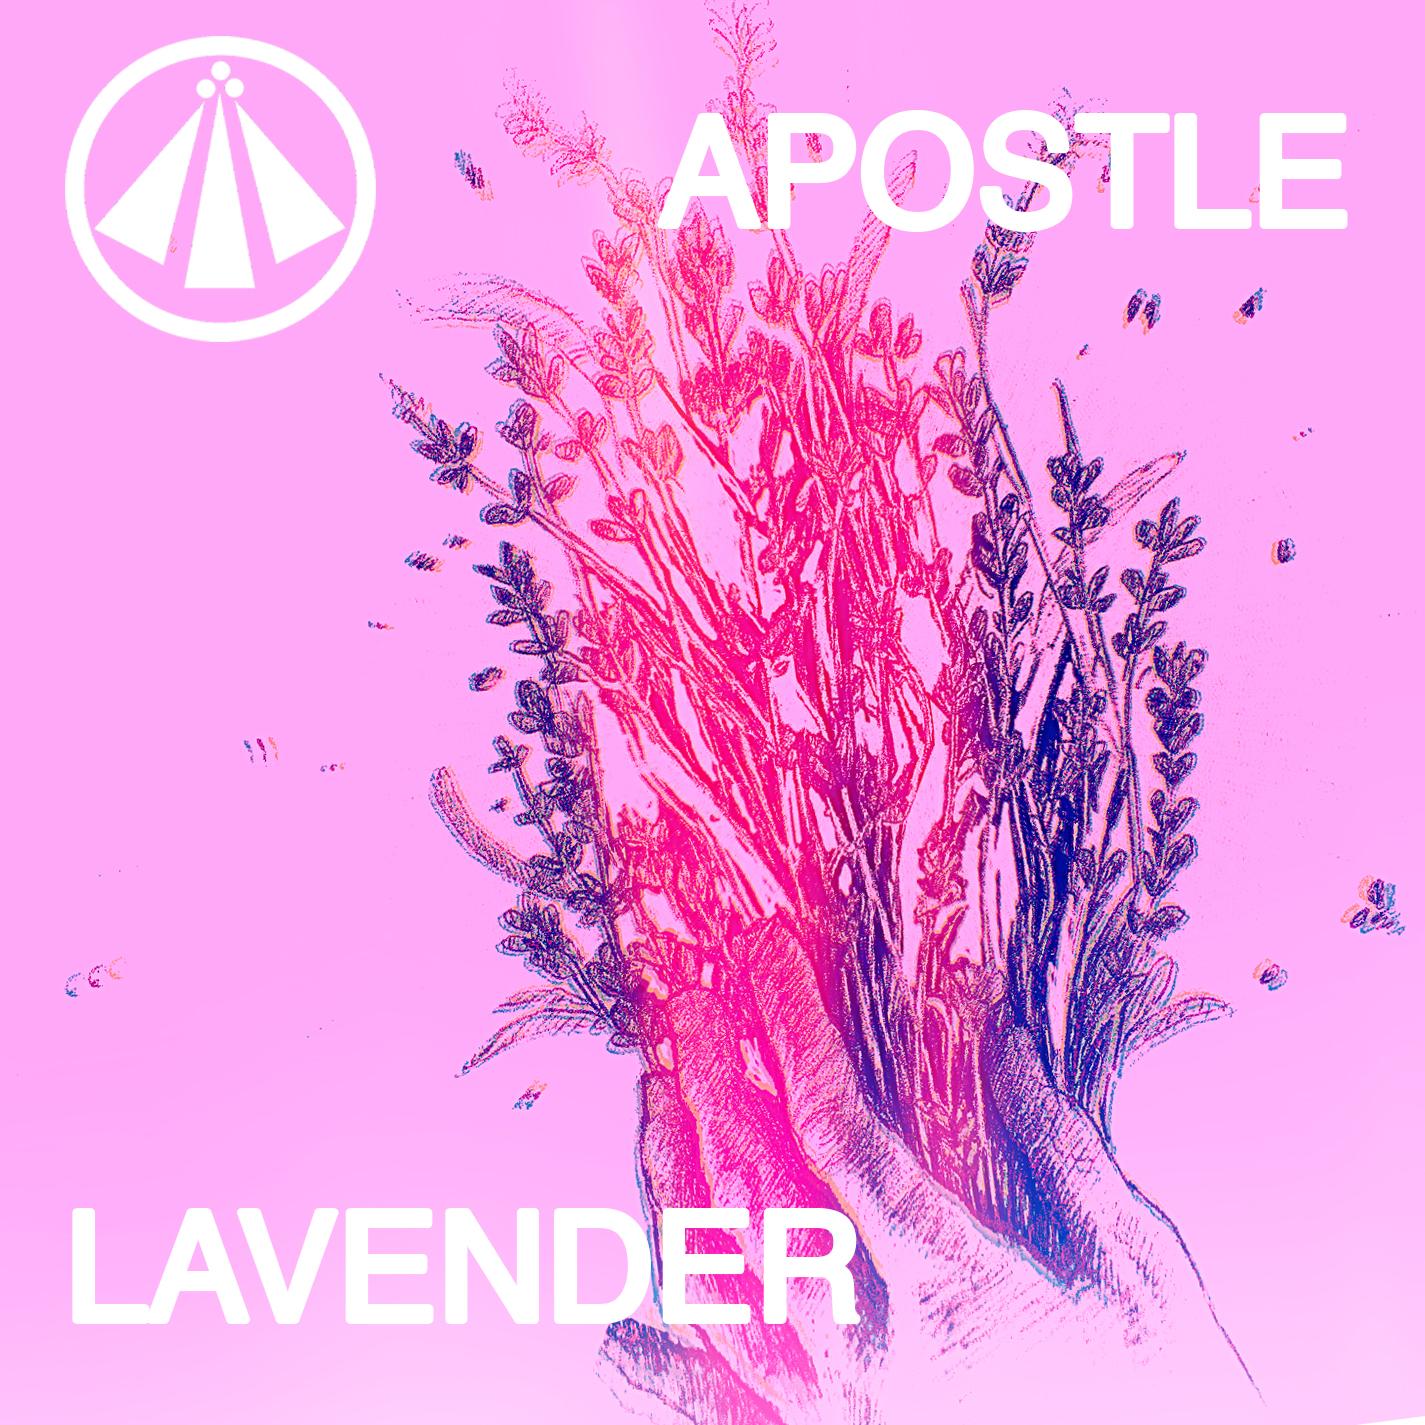 Apostle lavender art